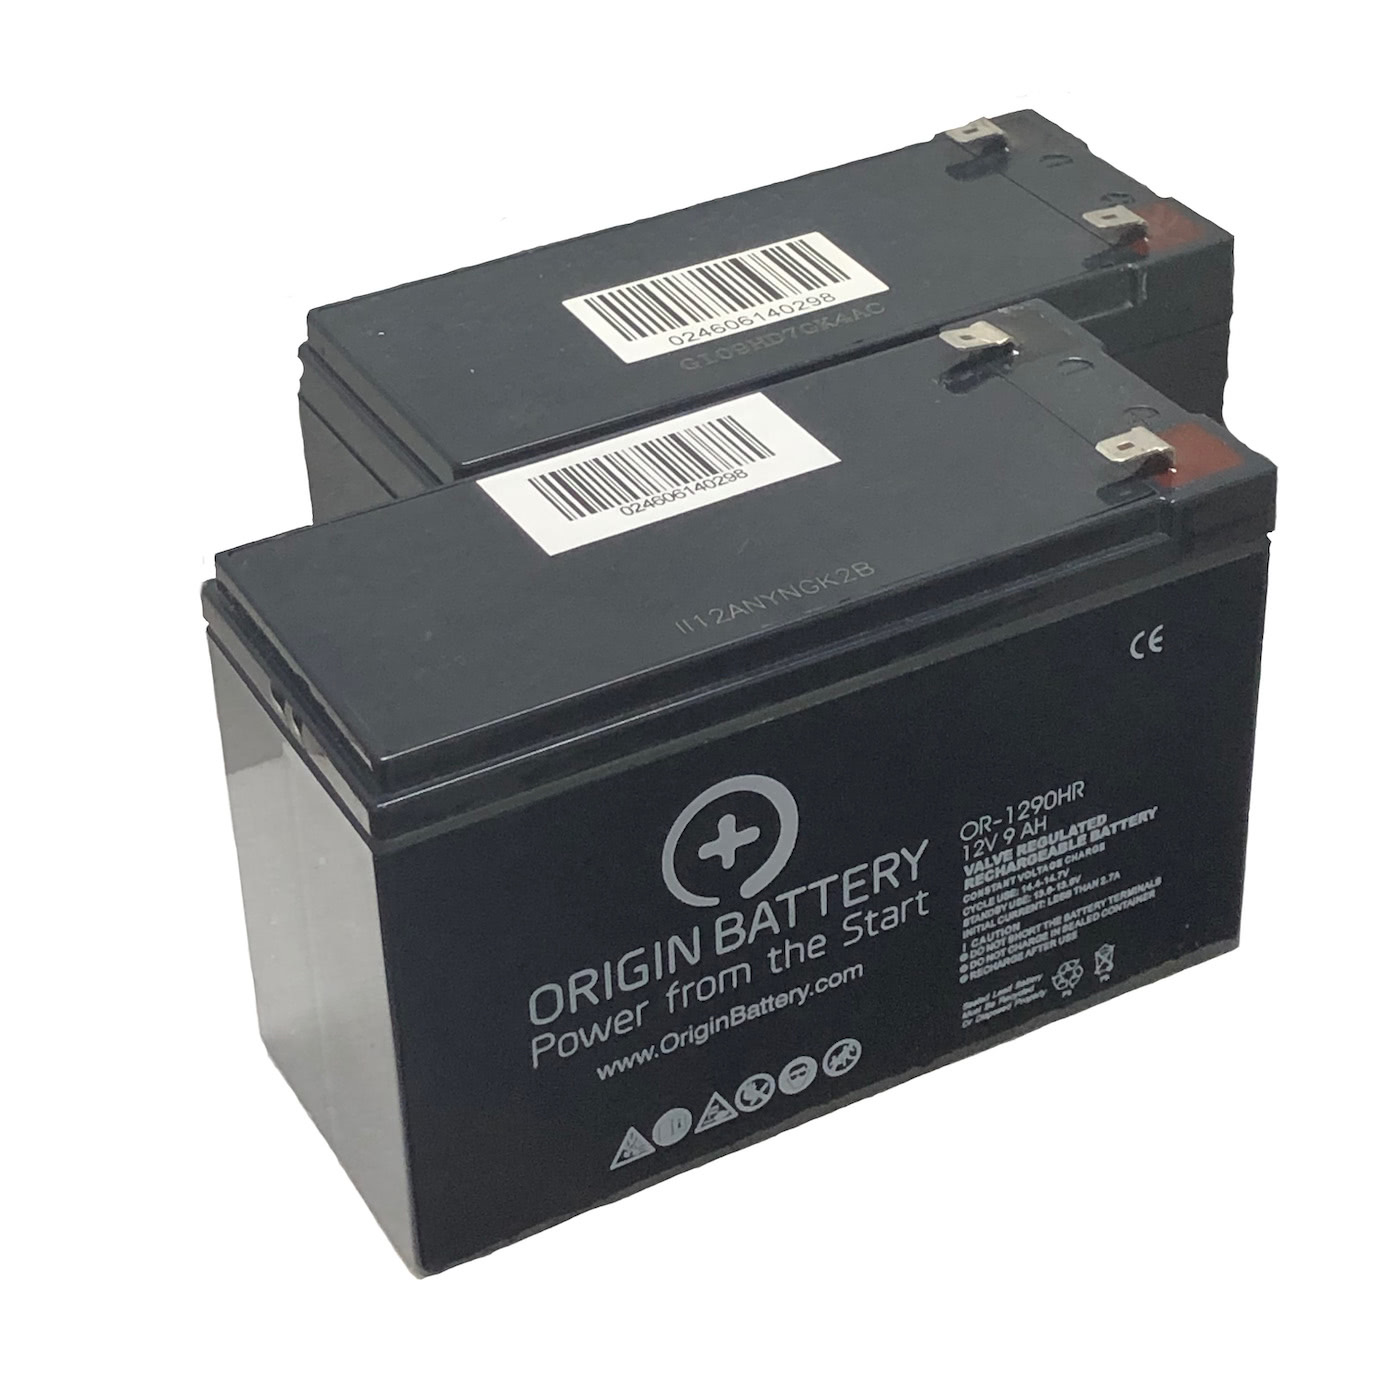 Cyberpower Lx1500gu Battery Replacement